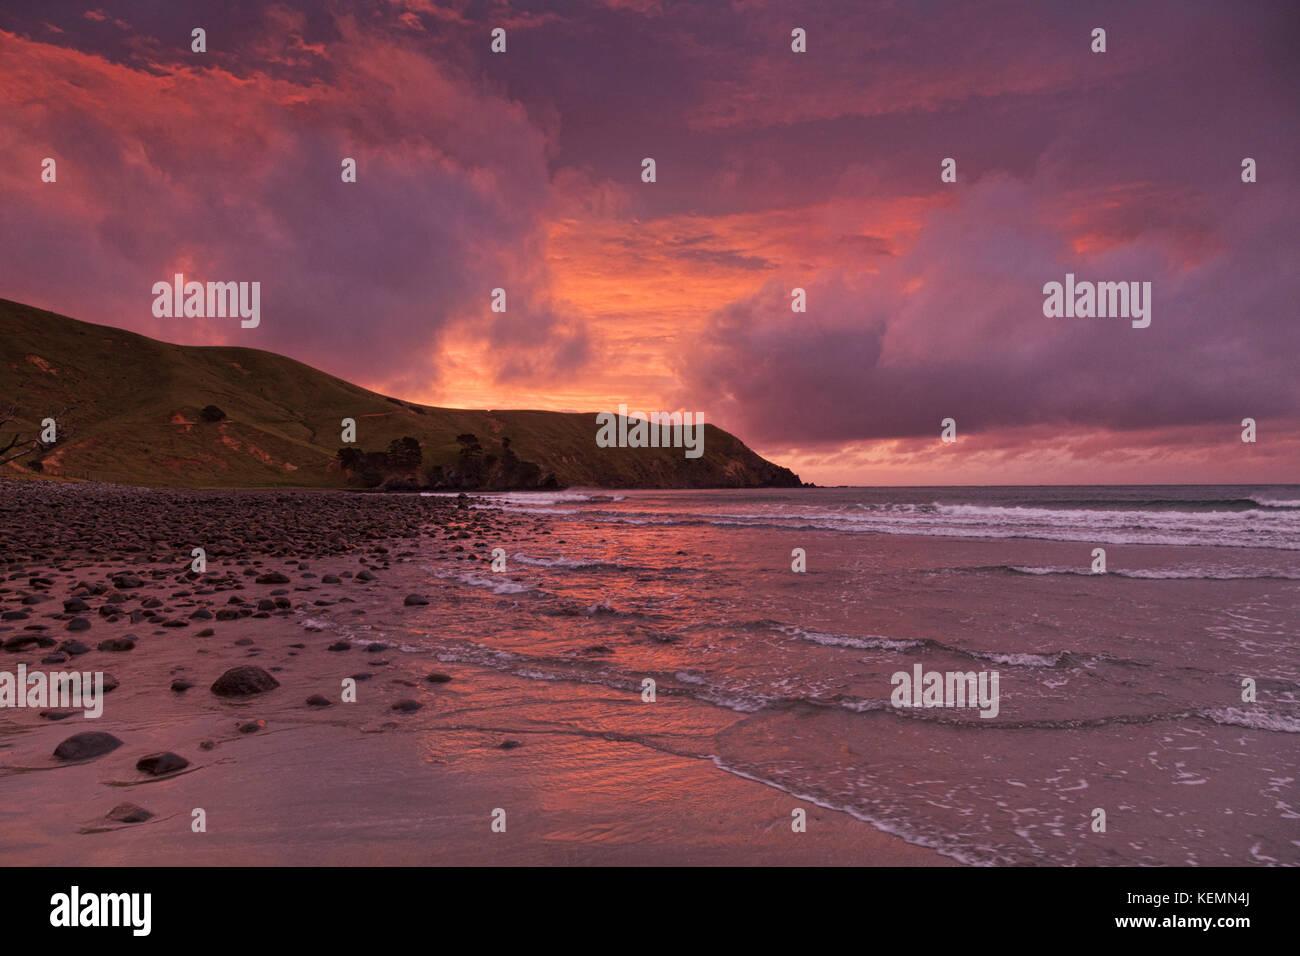 The bay at Port Jackson, Coromandel, New Zealand, at sunset, - Stock Image